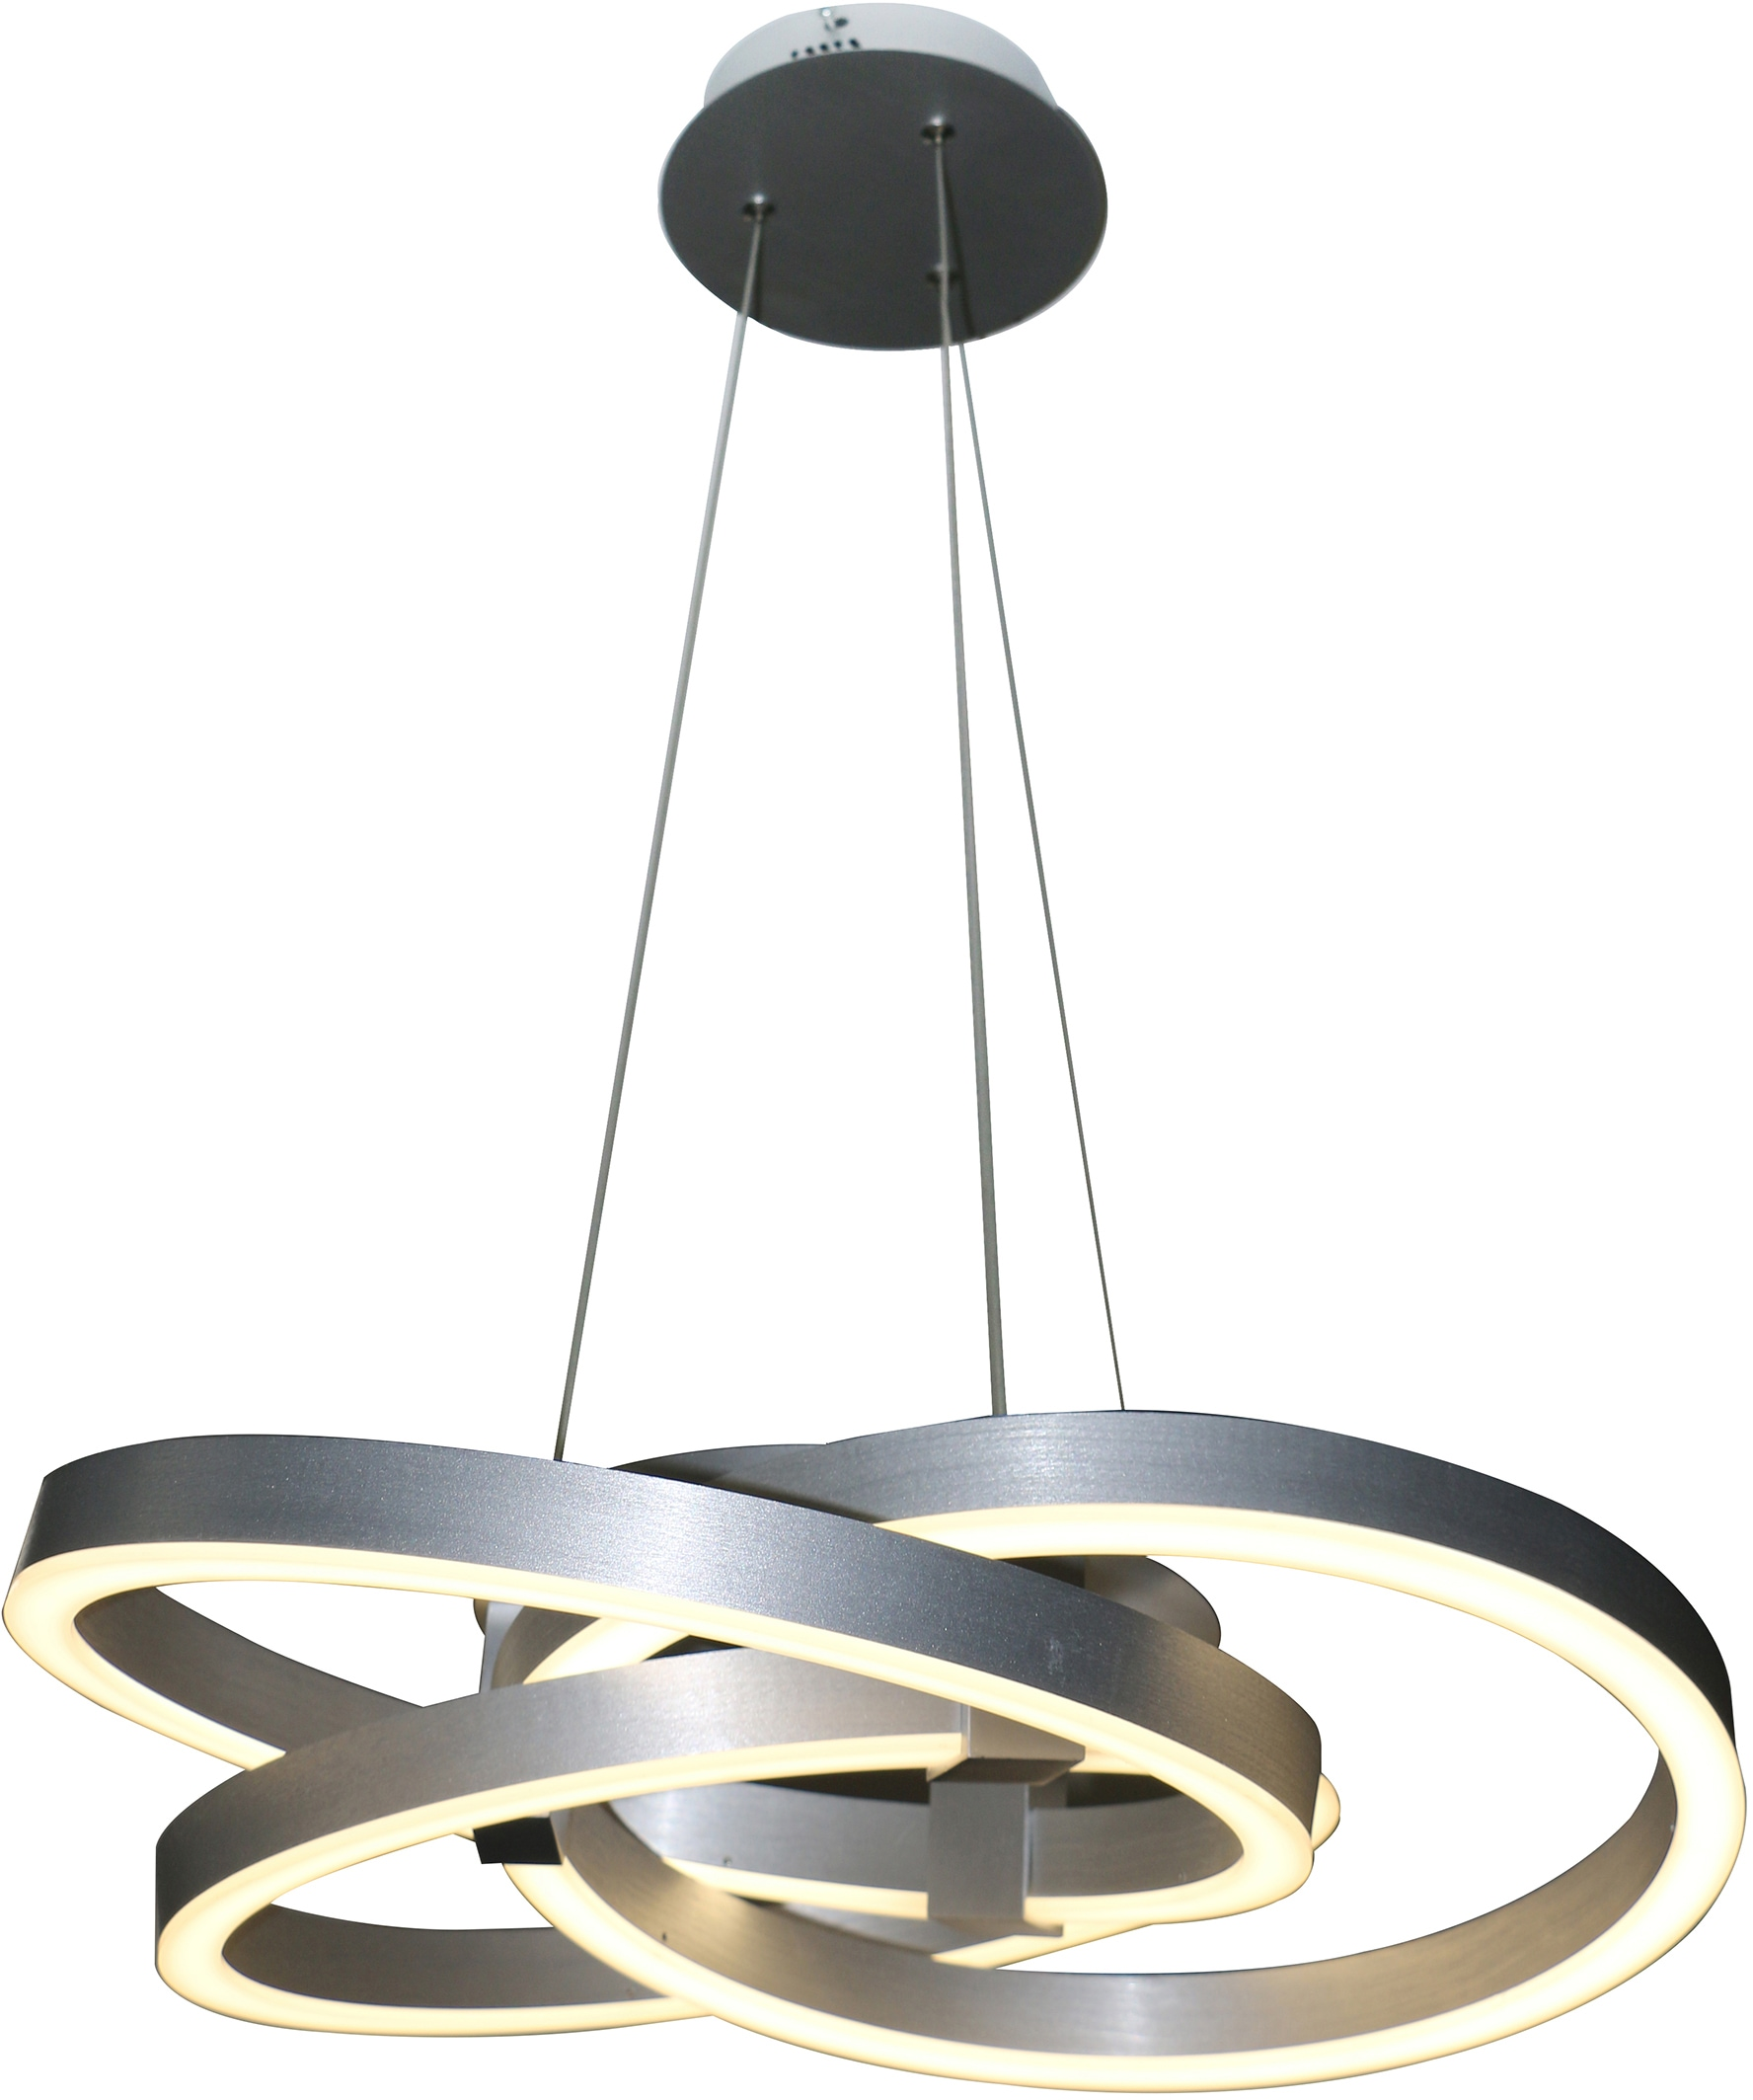 näve LED Pendelleuchte Divora, LED-Board, Neutralweiß-Kaltweiß, LED Hängelampe, LED Hängeleuchte, Smart Home